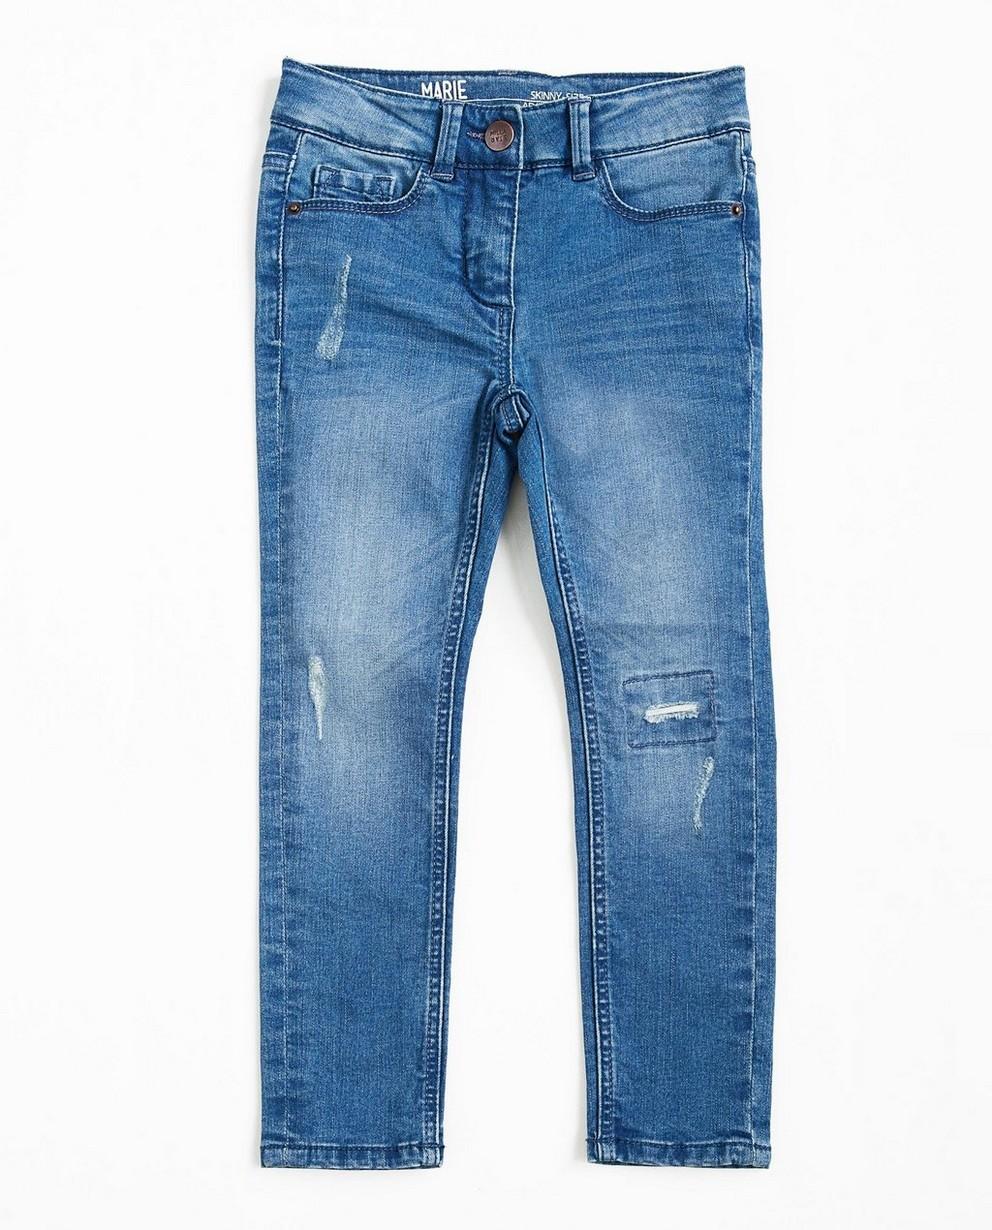 Jeans - aqua - Destroyed skinny jeans